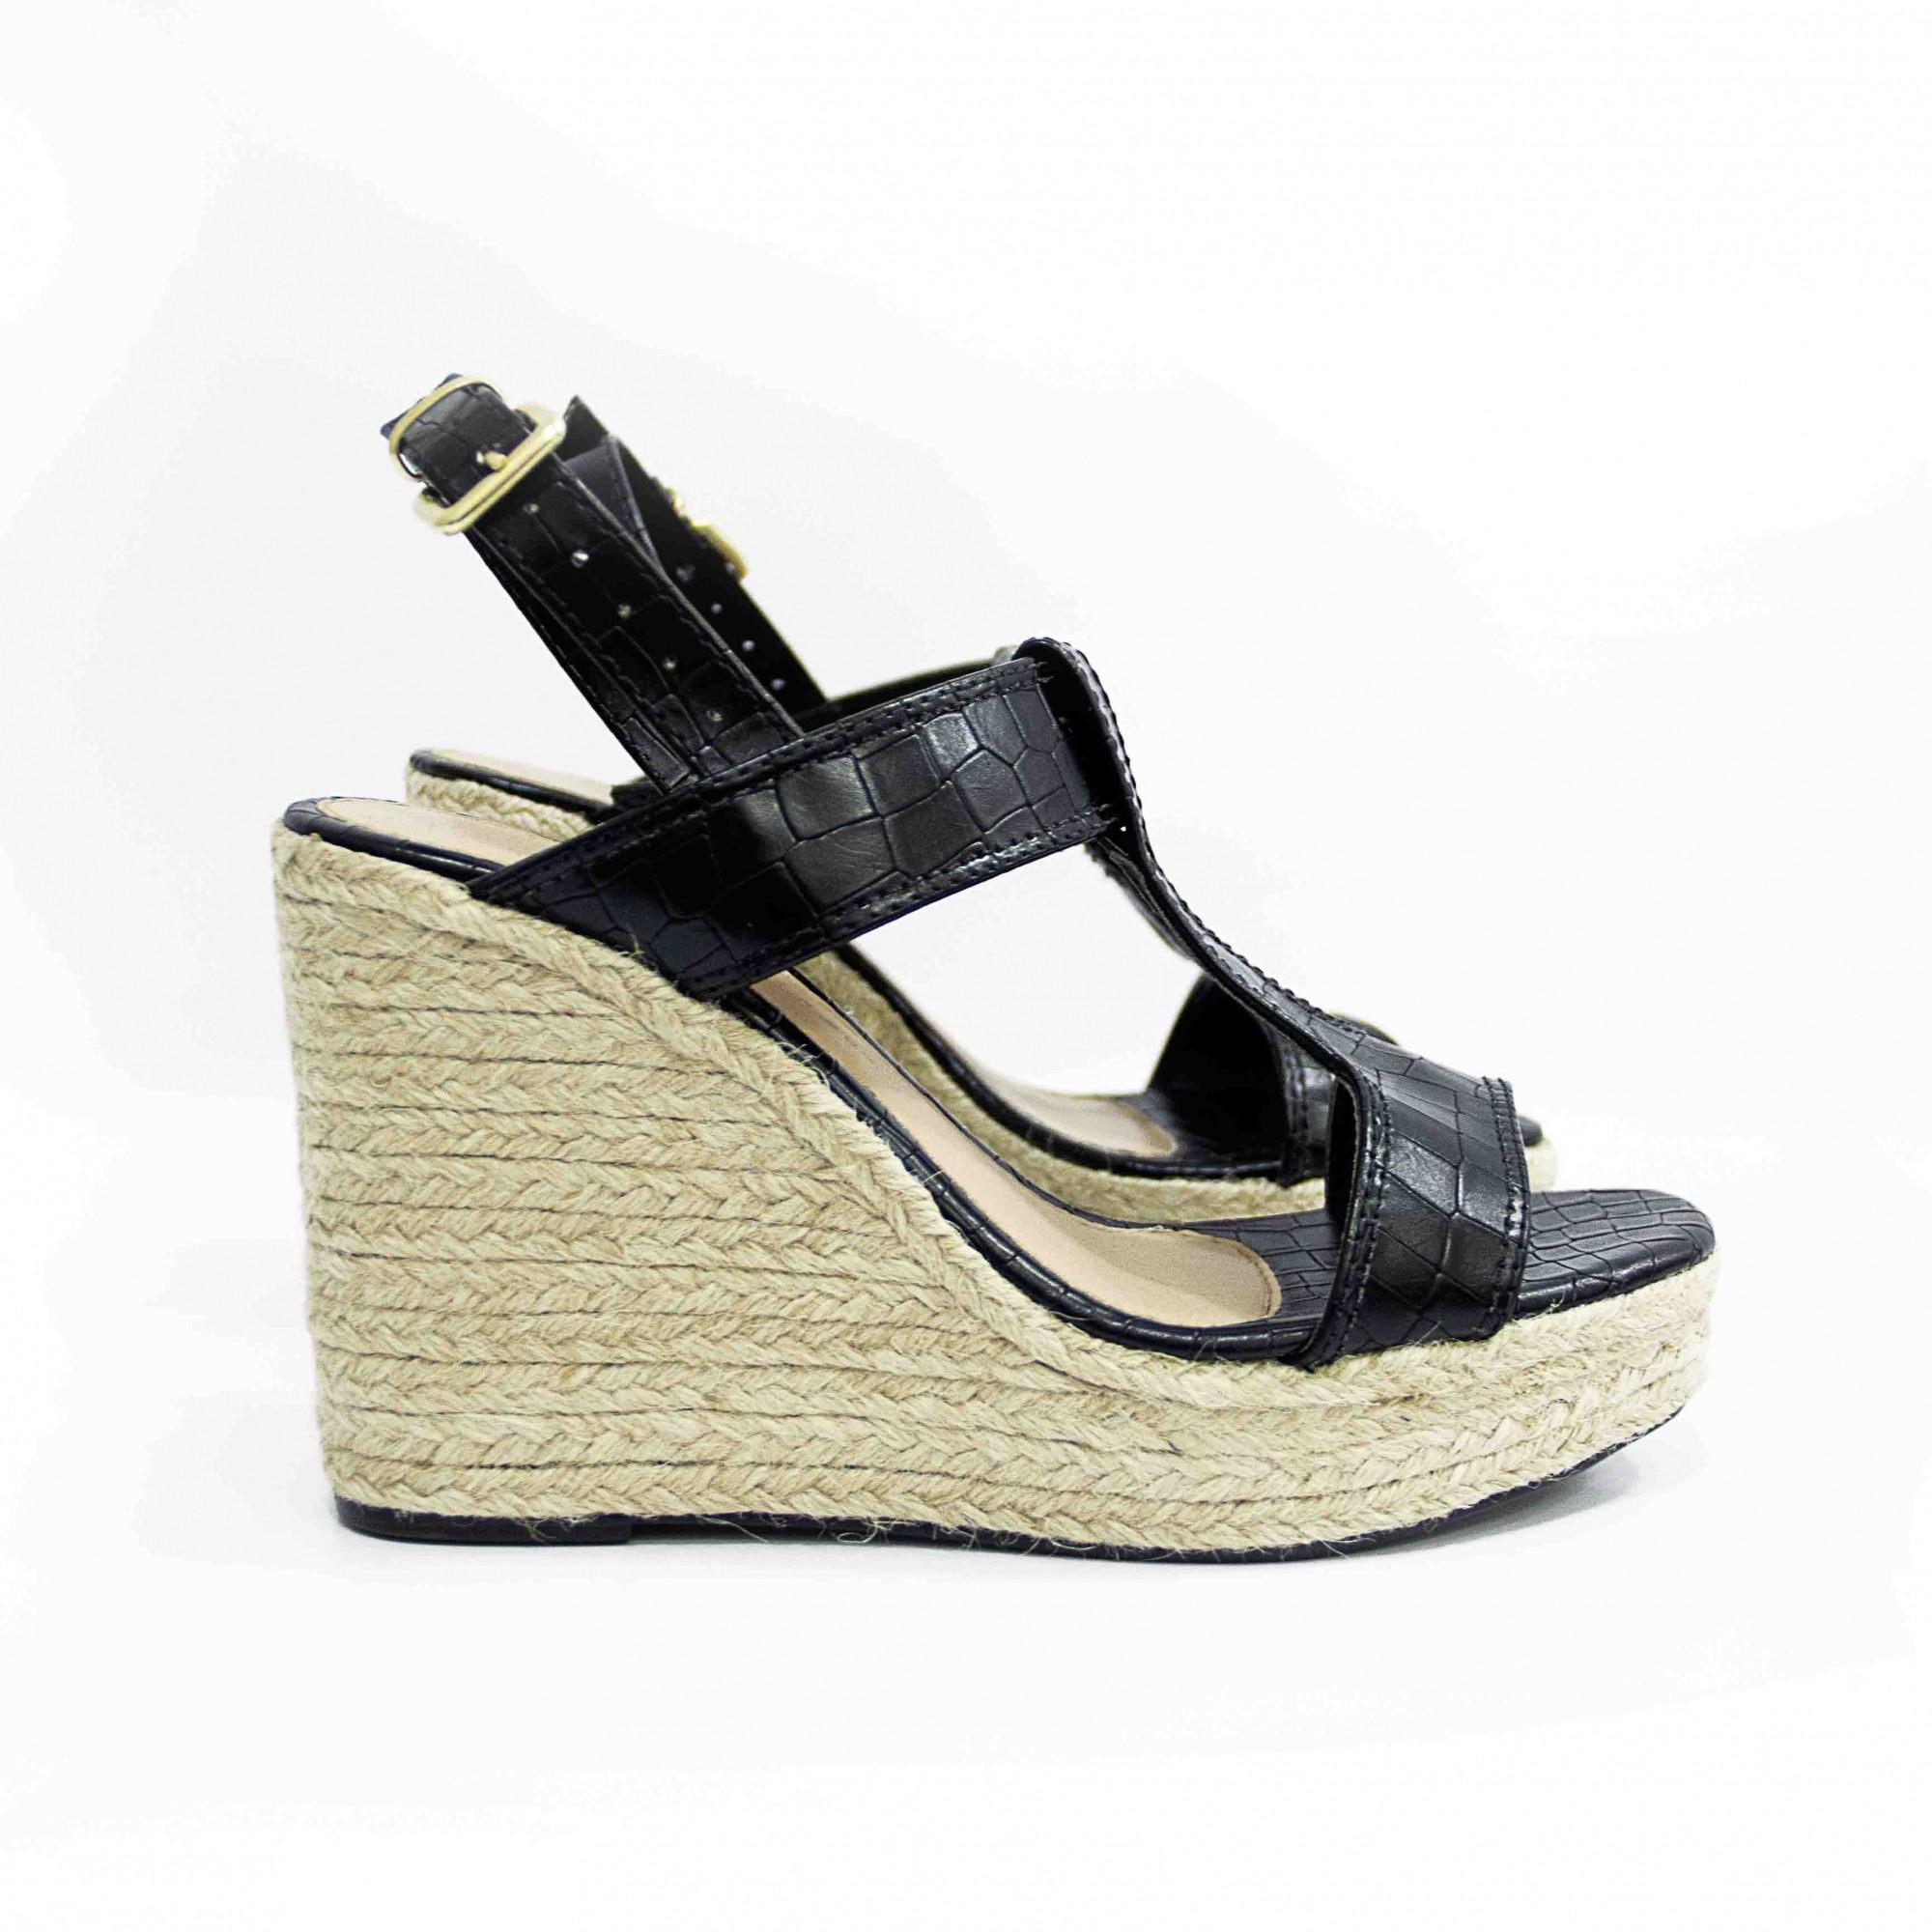 Sandália Plataforma Croco Preta by Deborah Munhoz